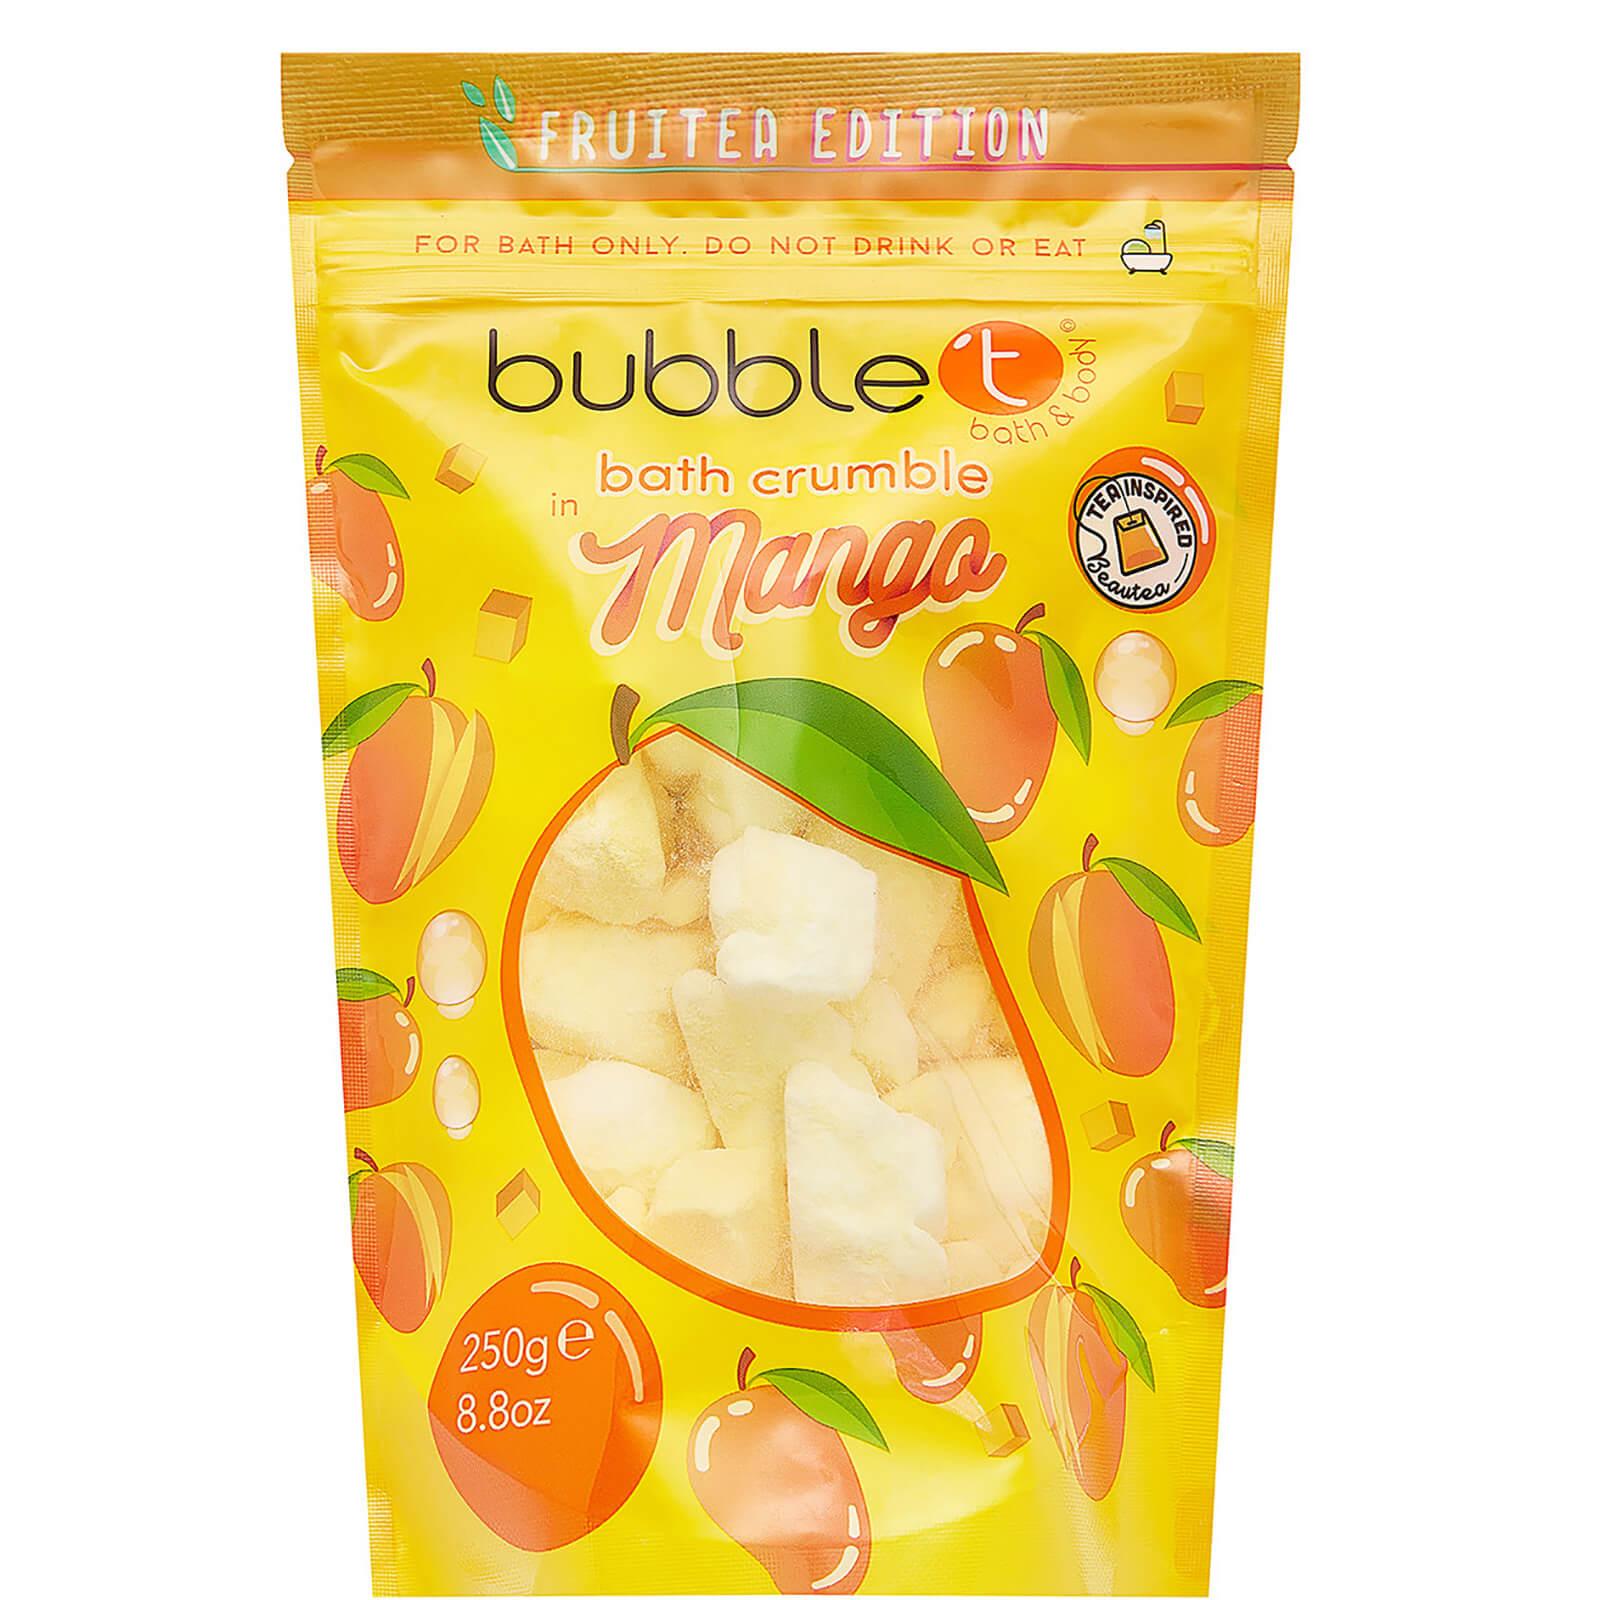 Купить Bubble T Bath Crumble - Mango 250g